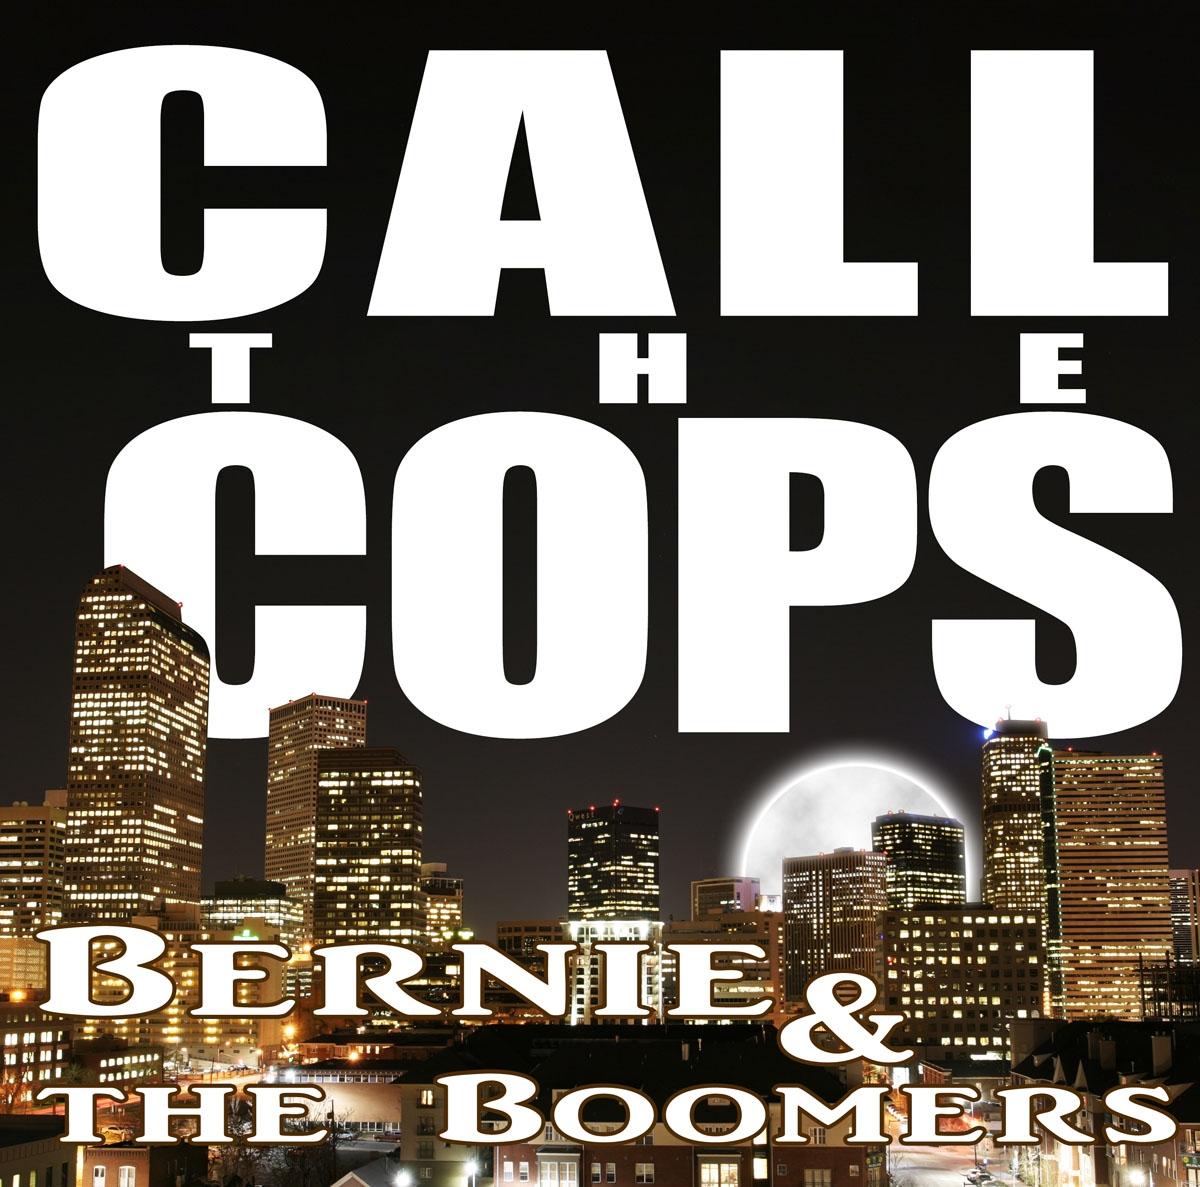 Bernie & The Boomers Call the Cops